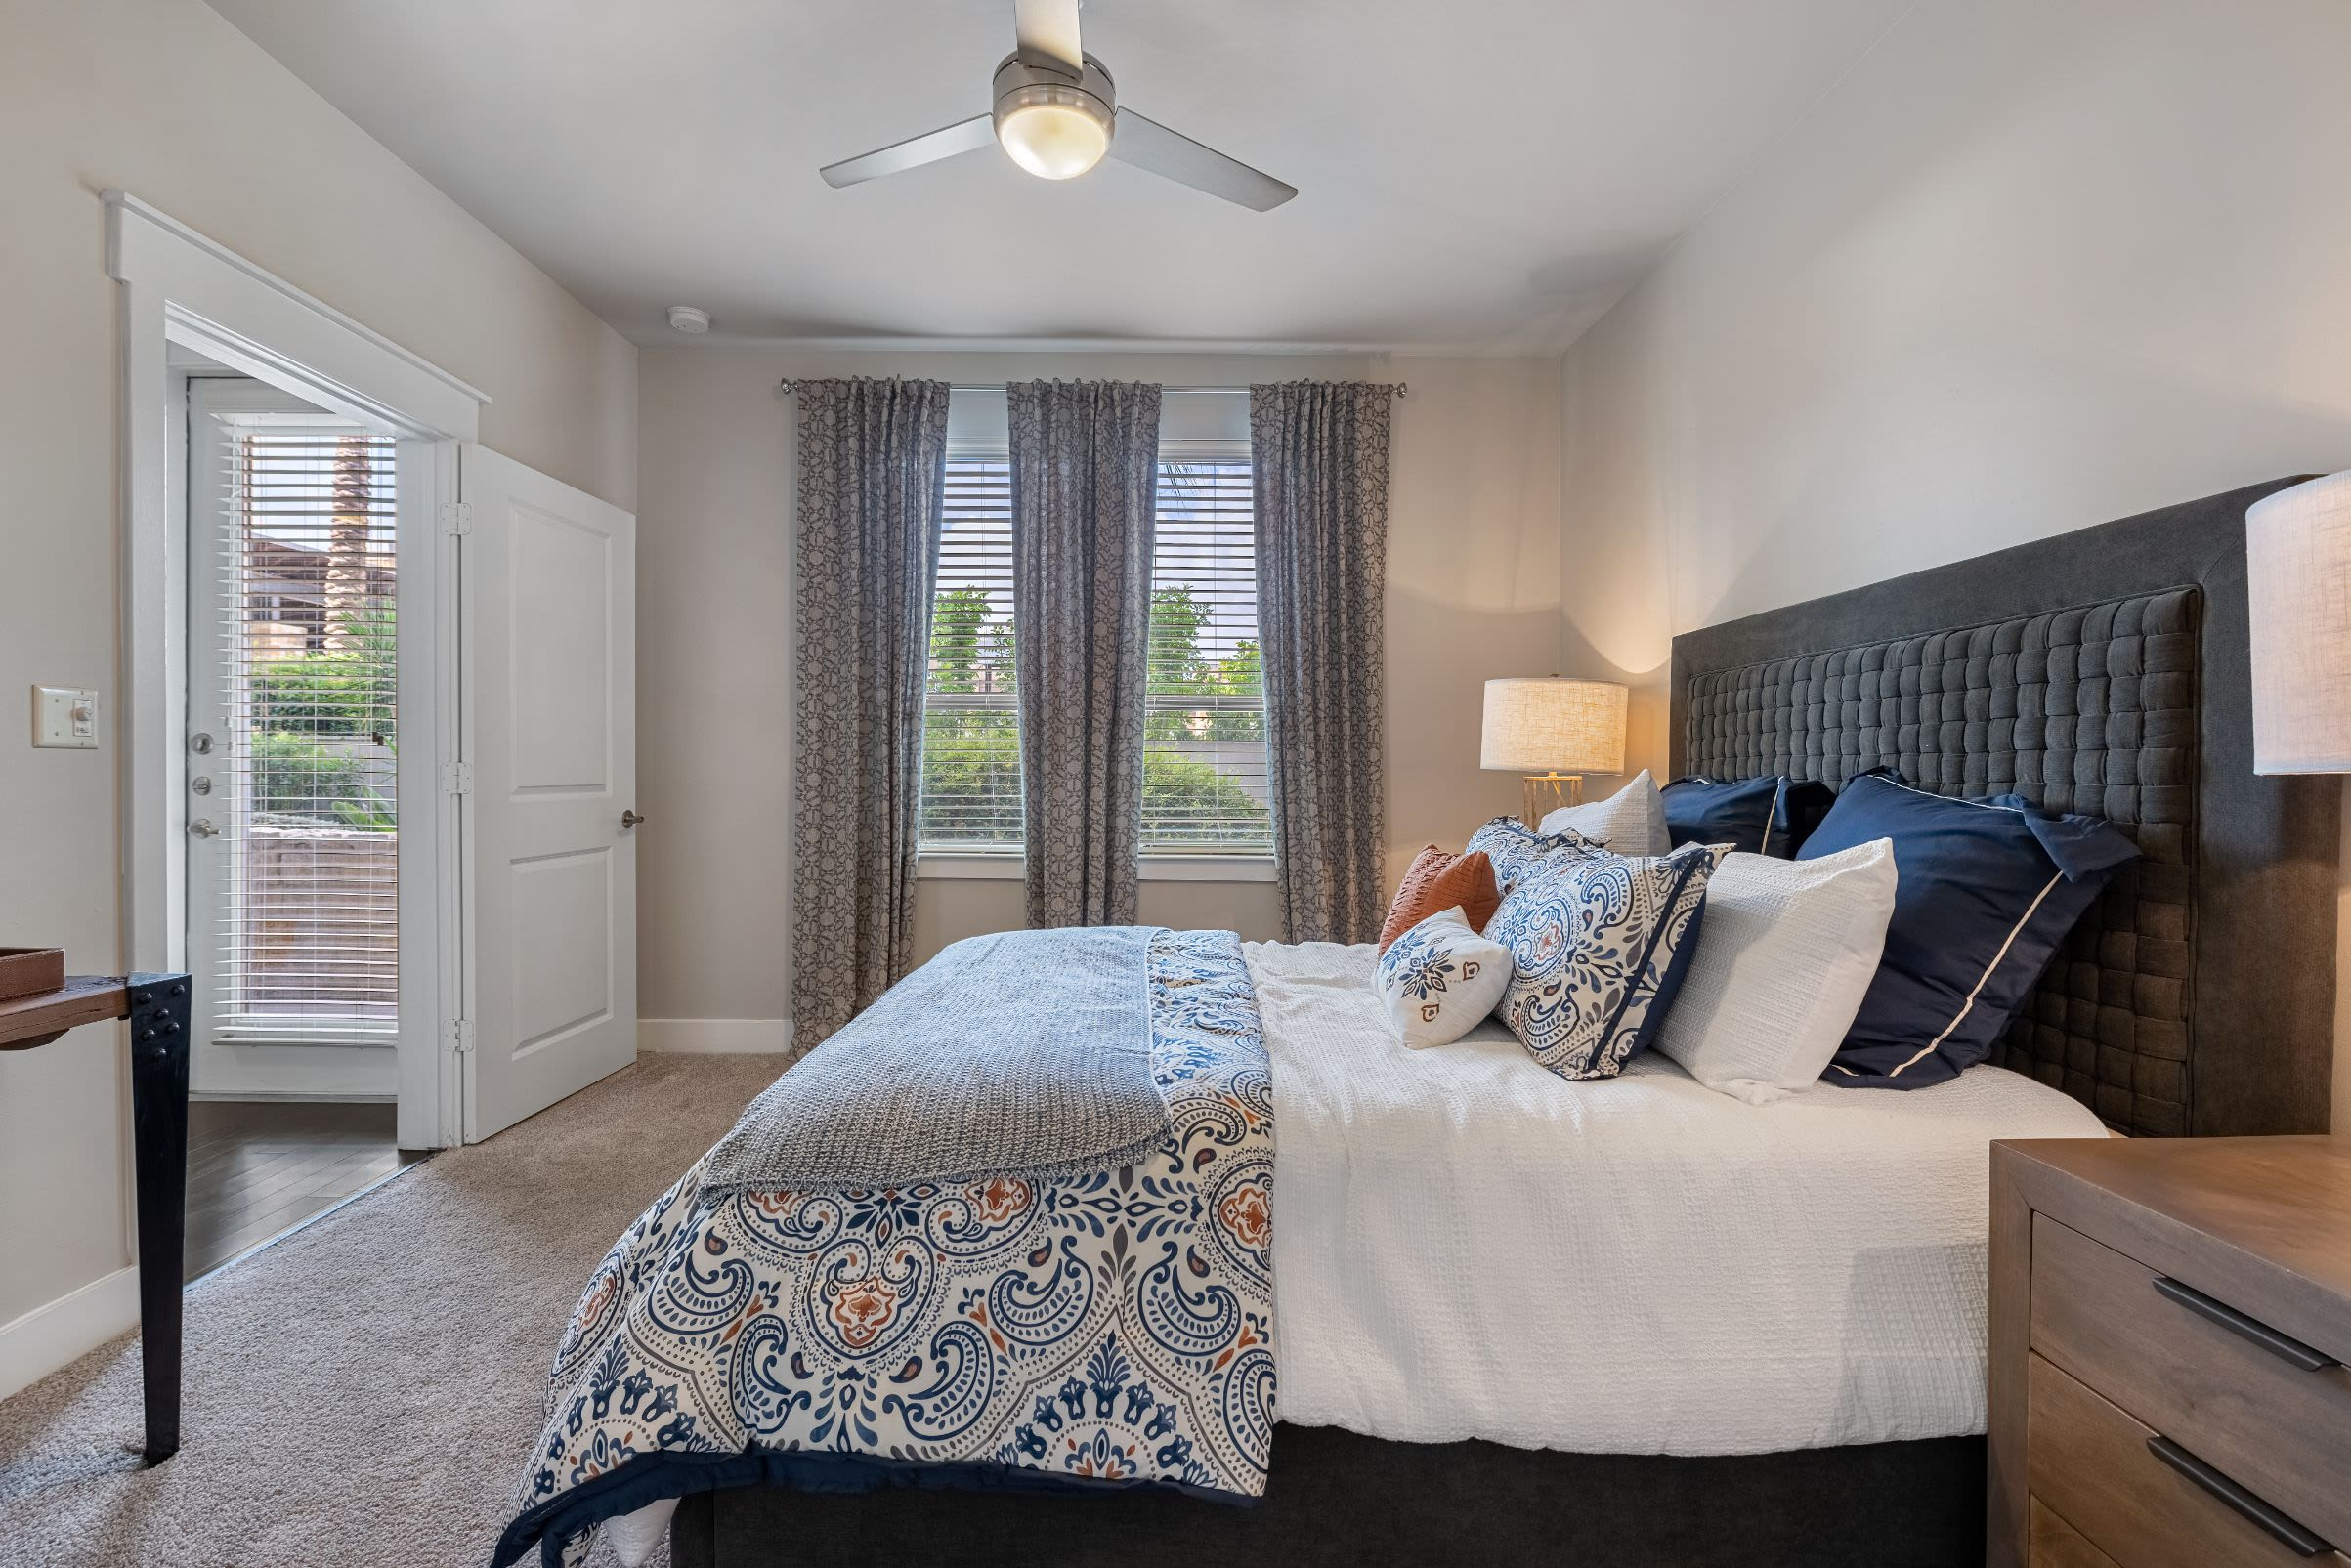 Bedroom with a large window at Marquis Cresta Bella in San Antonio, Texas